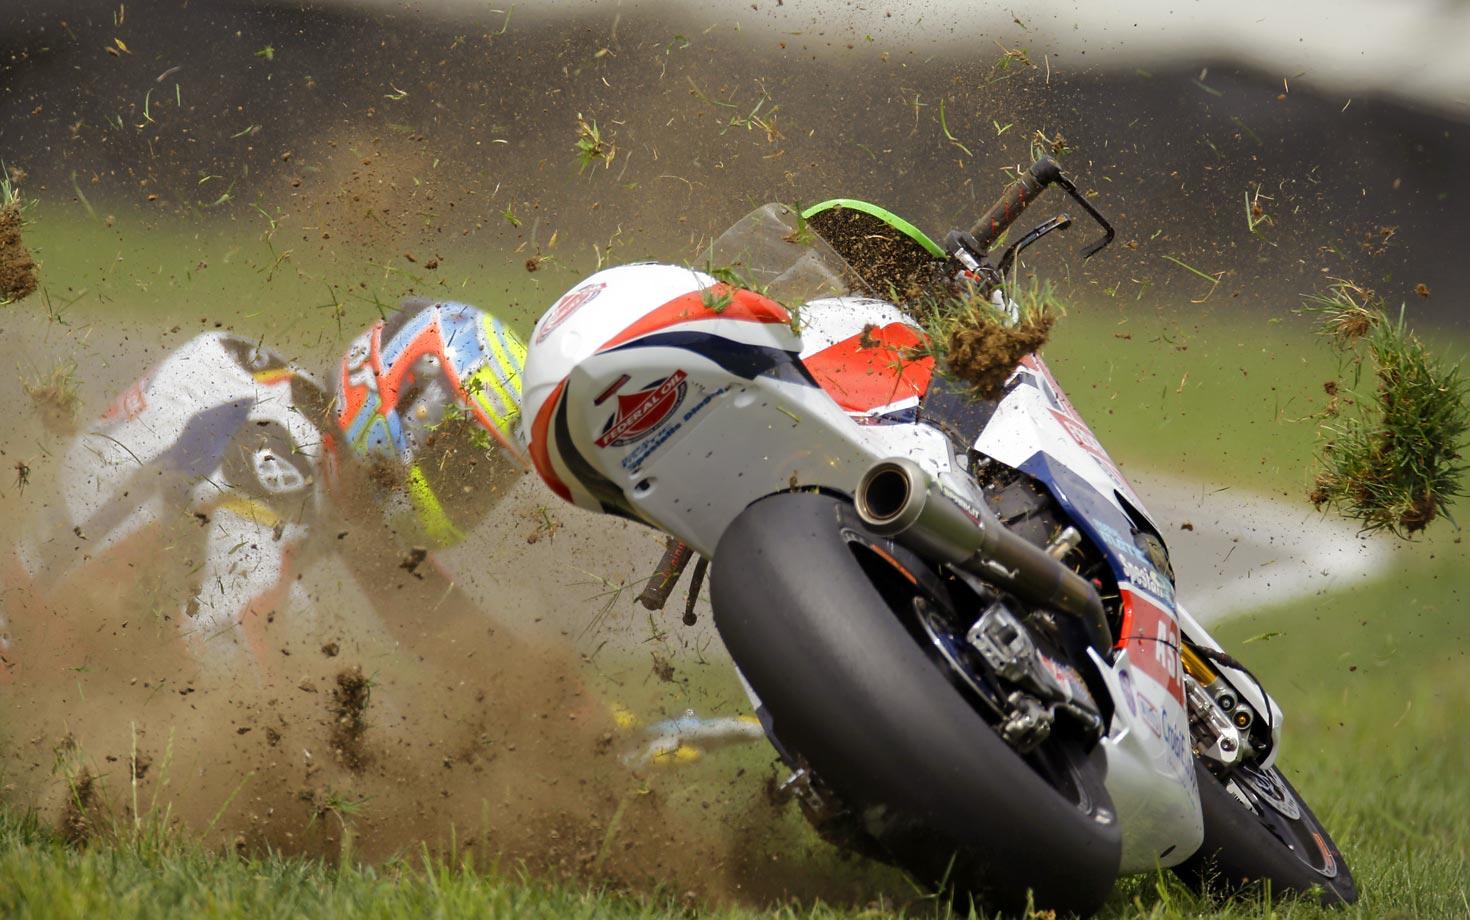 Xavier Simeon of Belgium crashes during the Indianapolis Moto 2 race in Indianapolis on Sunday, Aug. 17.